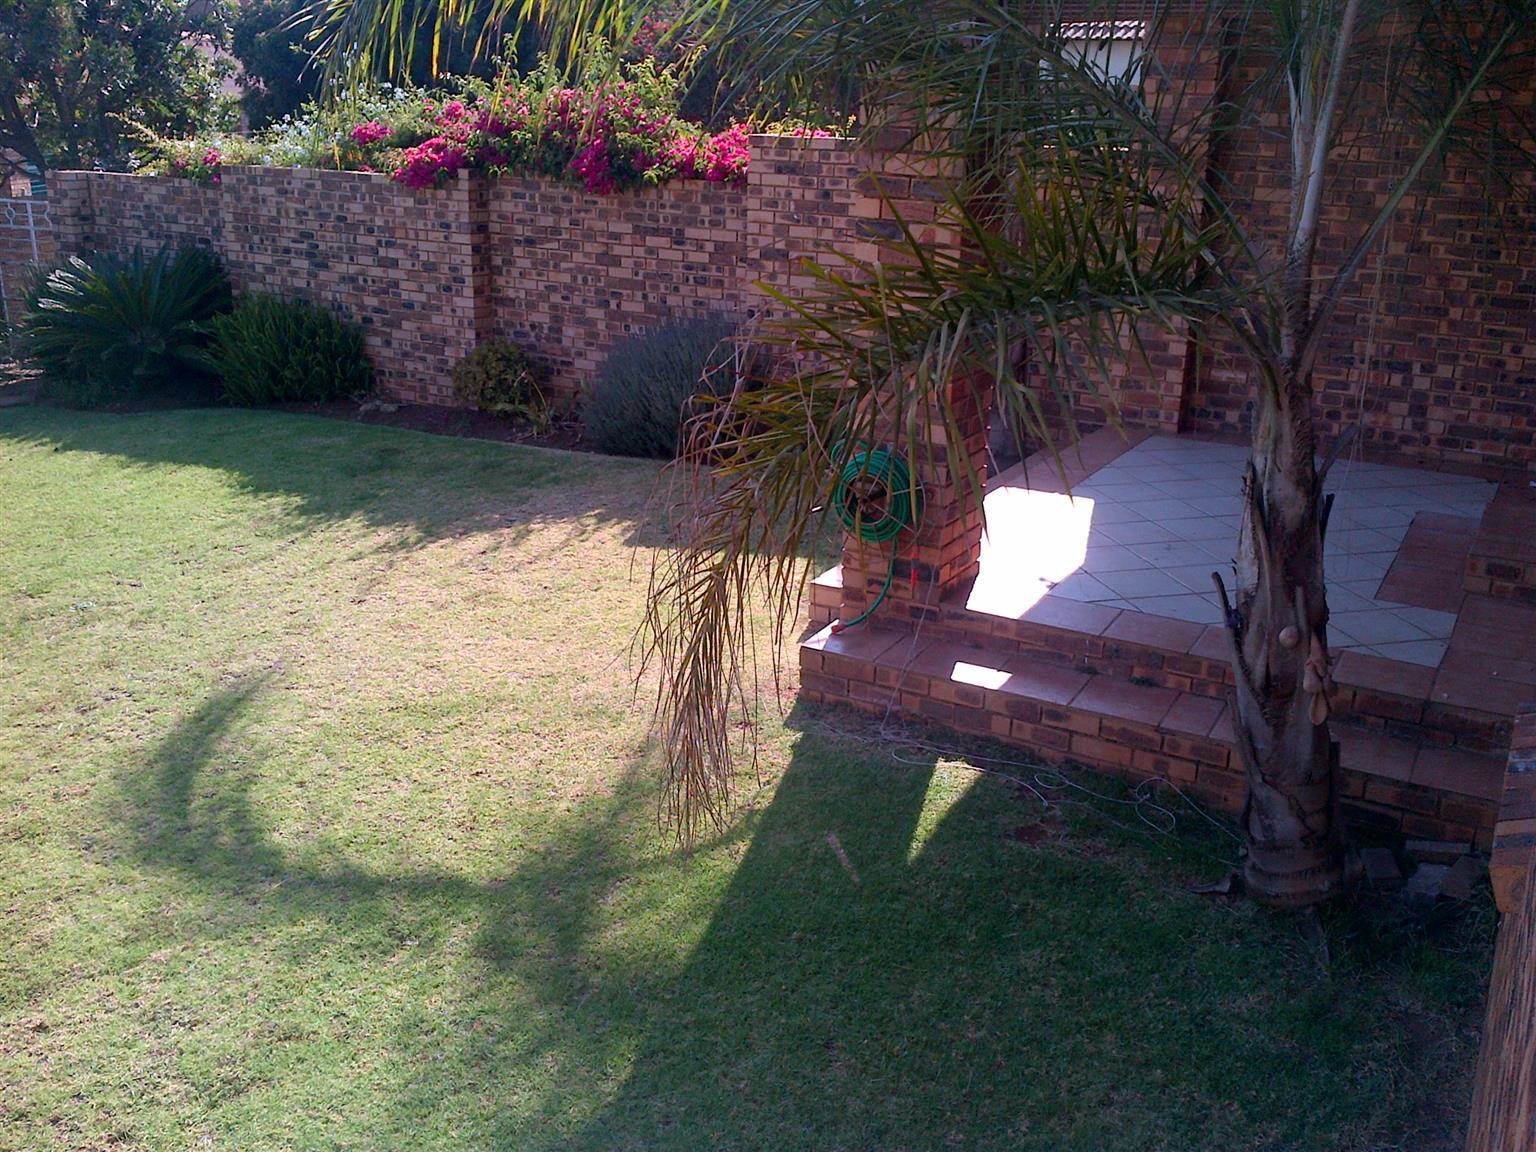 MoreletaPark. 2 Bed townhouse, 2 bathr, d/garage, lovely big garden. Quiet area. 1 January 2018. 0827842141.